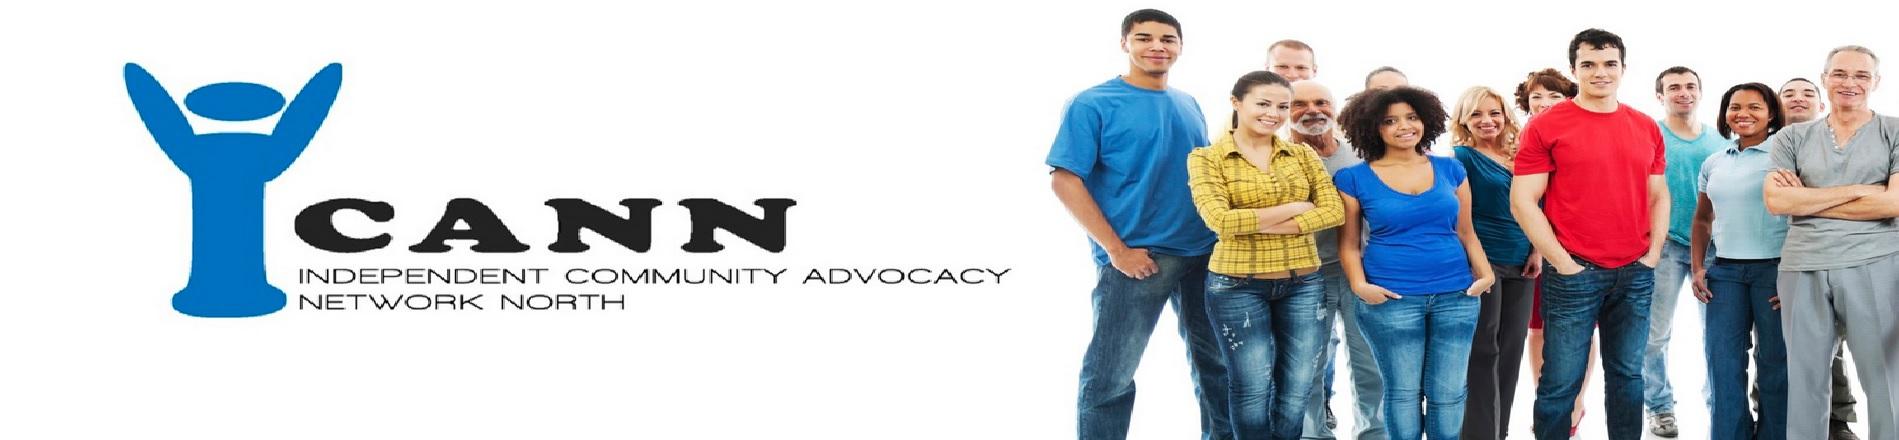 ICANN Banner.jpg